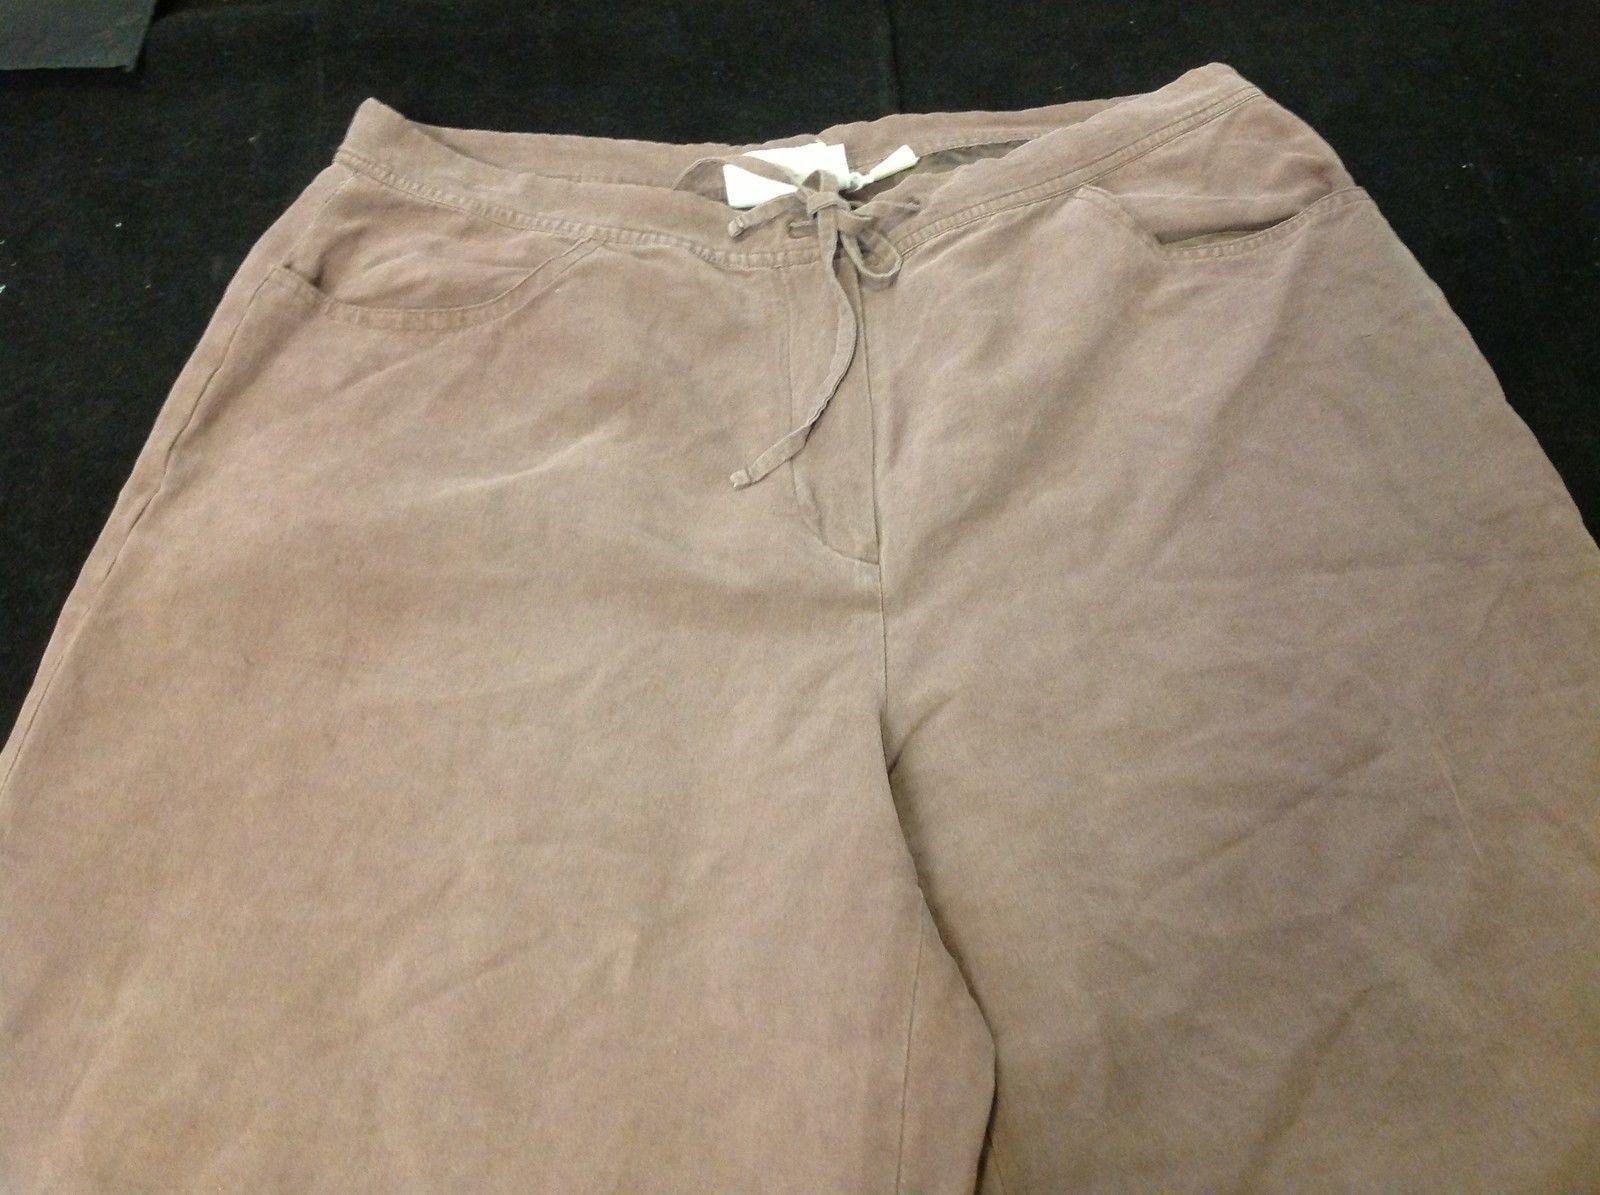 Ladies Liz Claiborne Brown Capri Pants Size 16W